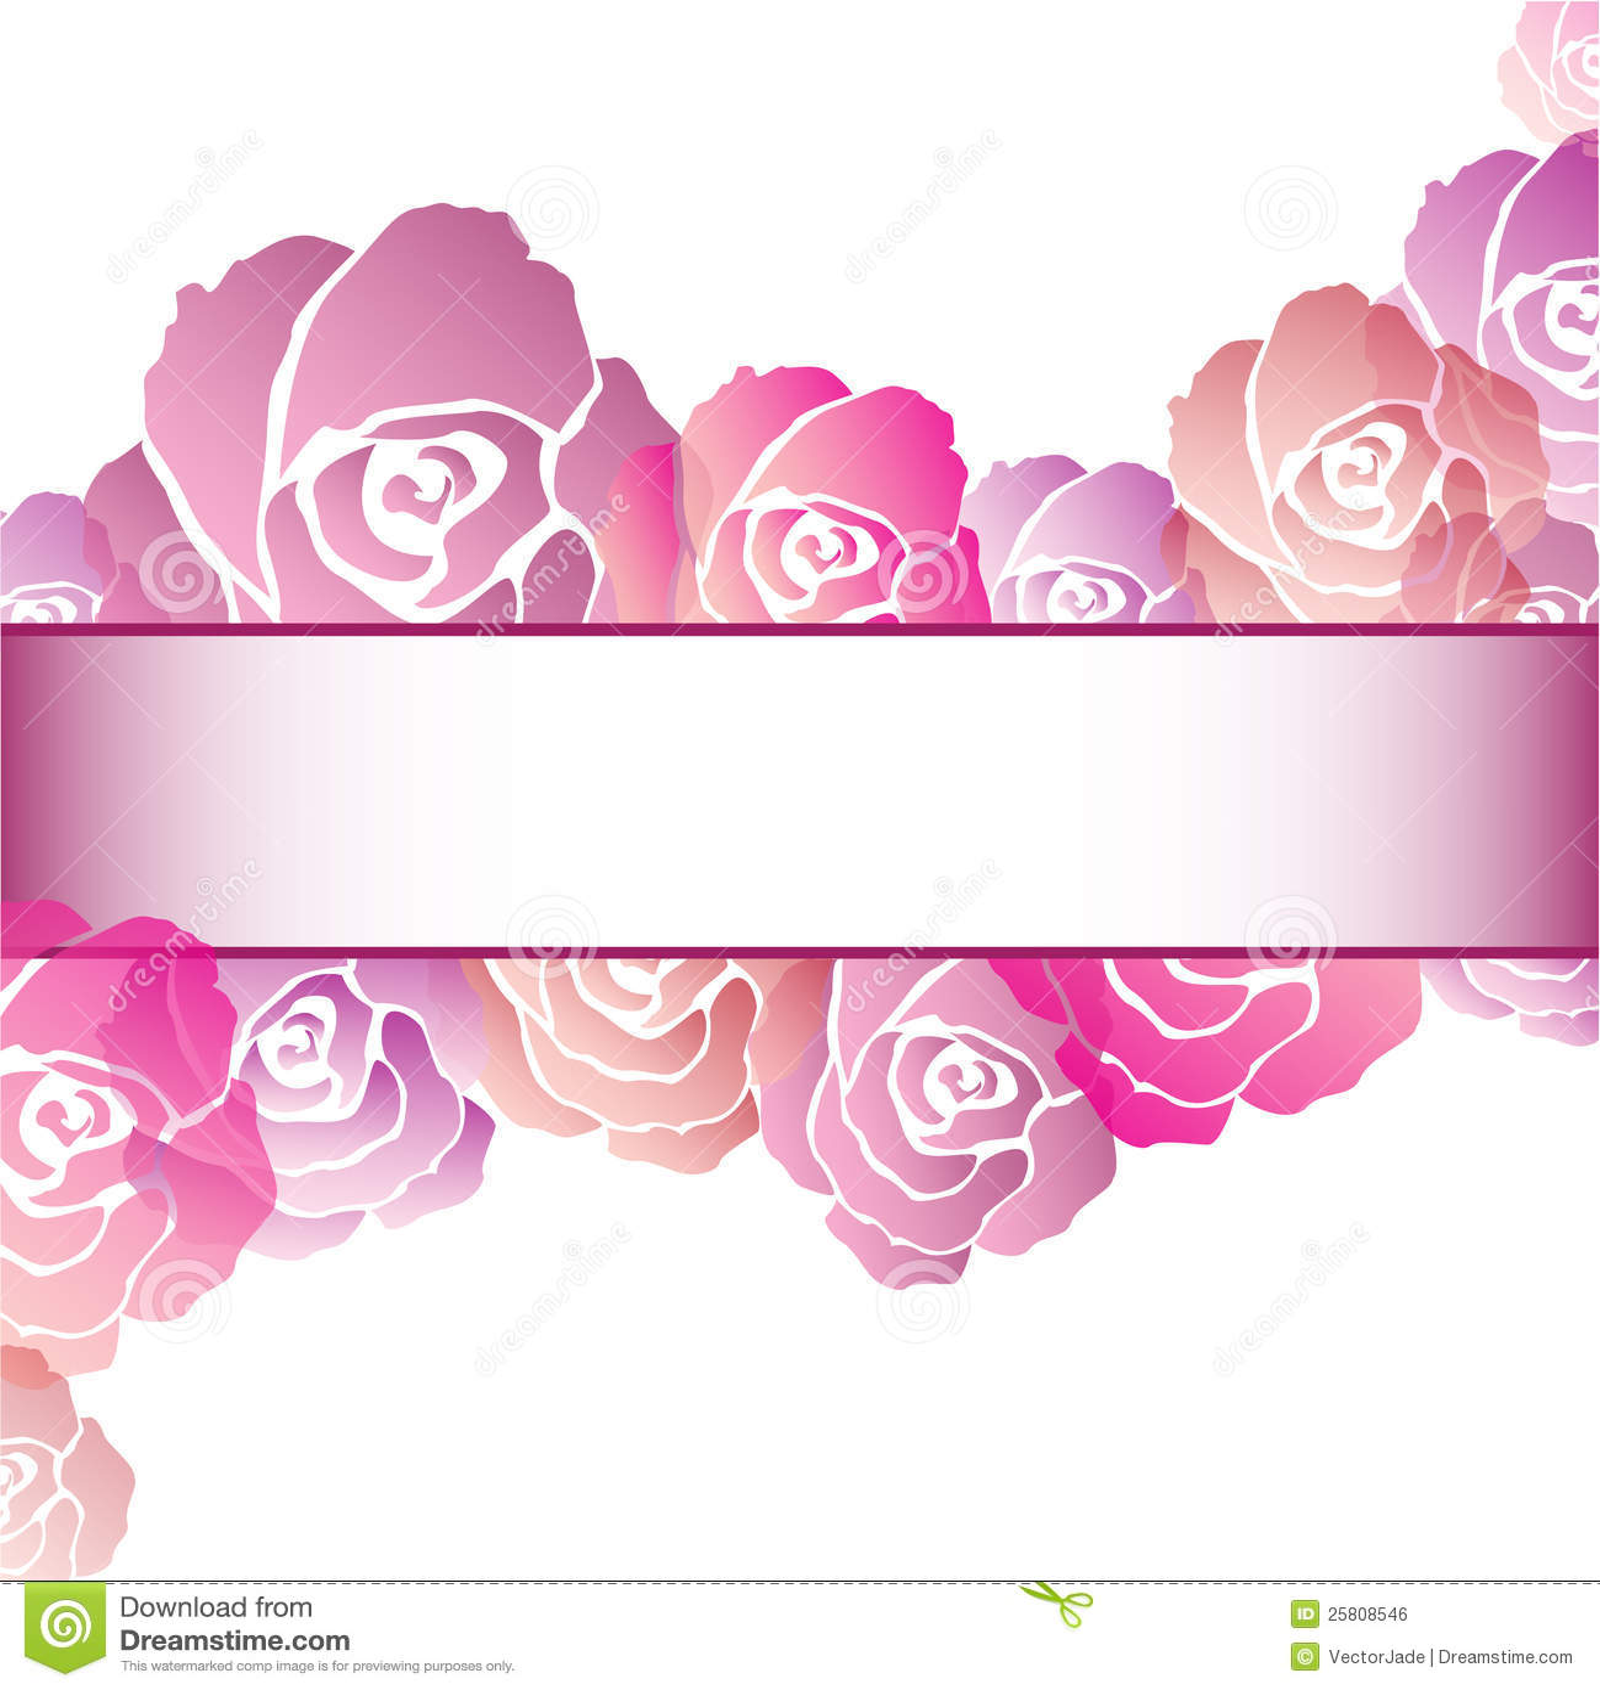 Pink Rose Frame Background Royalty Free Stock Image - Image: 25808546